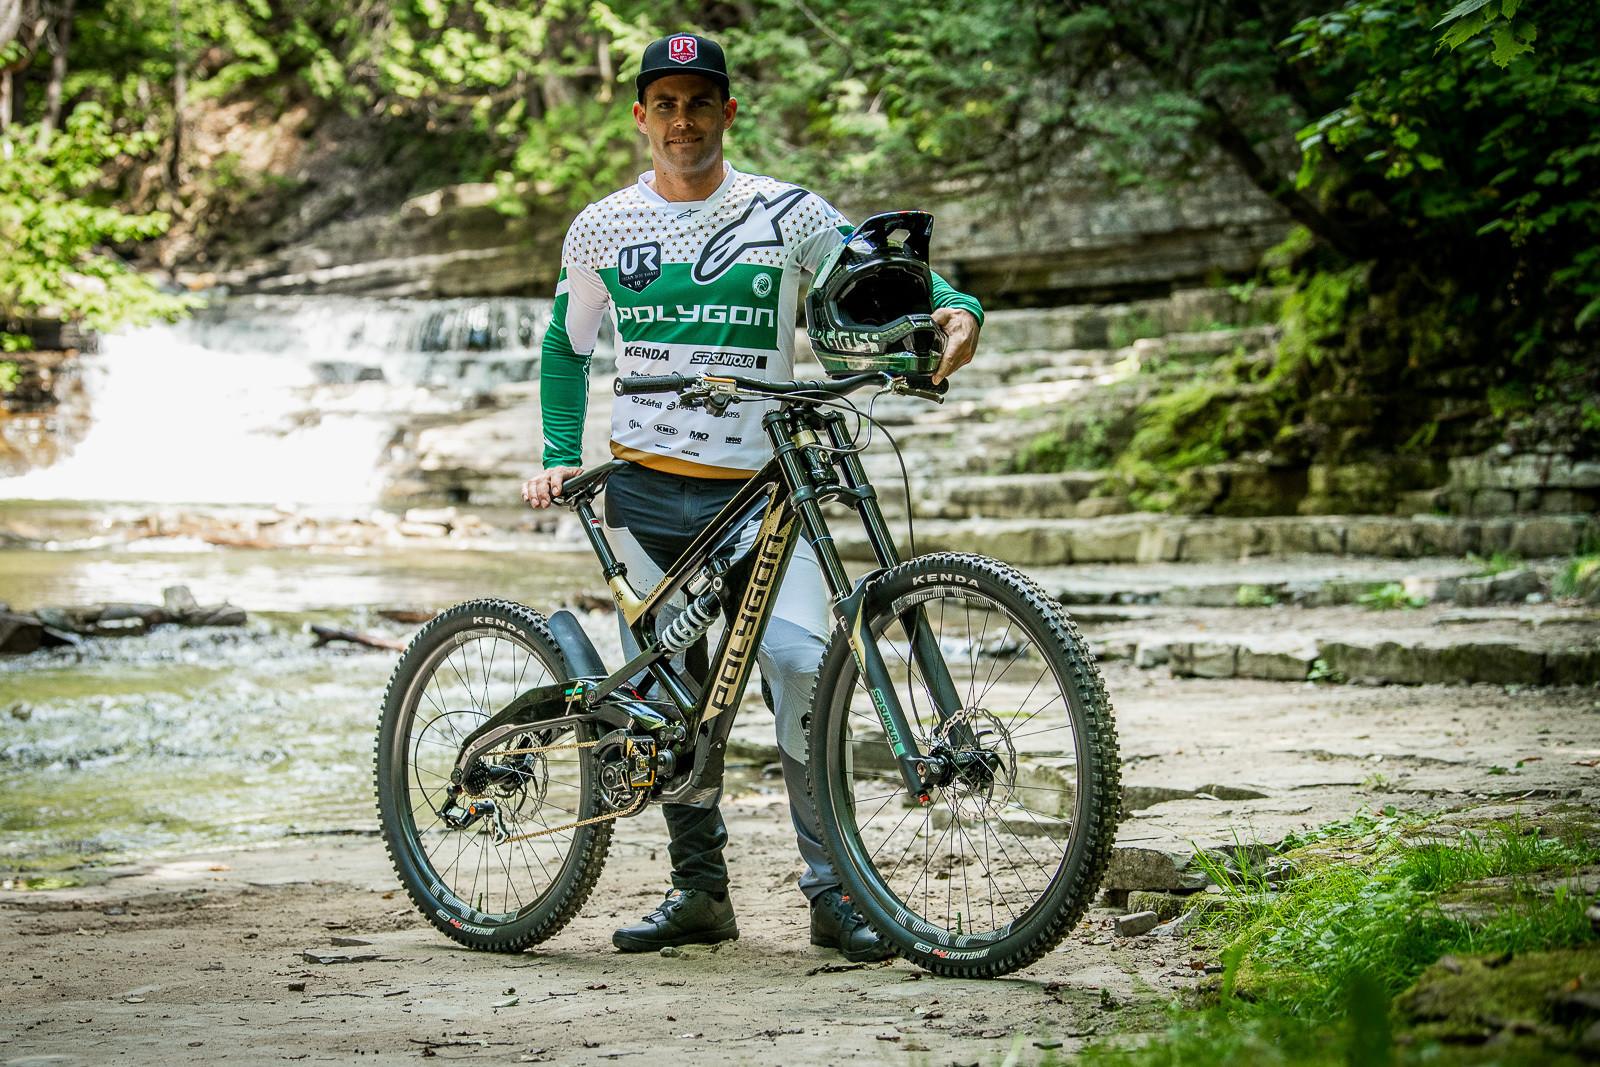 Mick Hannah with his Polygon World Championships DH Race Bike - Tracey and Mick Hannah's World Champs Polygon DH Race Bikes - Mountain Biking Pictures - Vital MTB